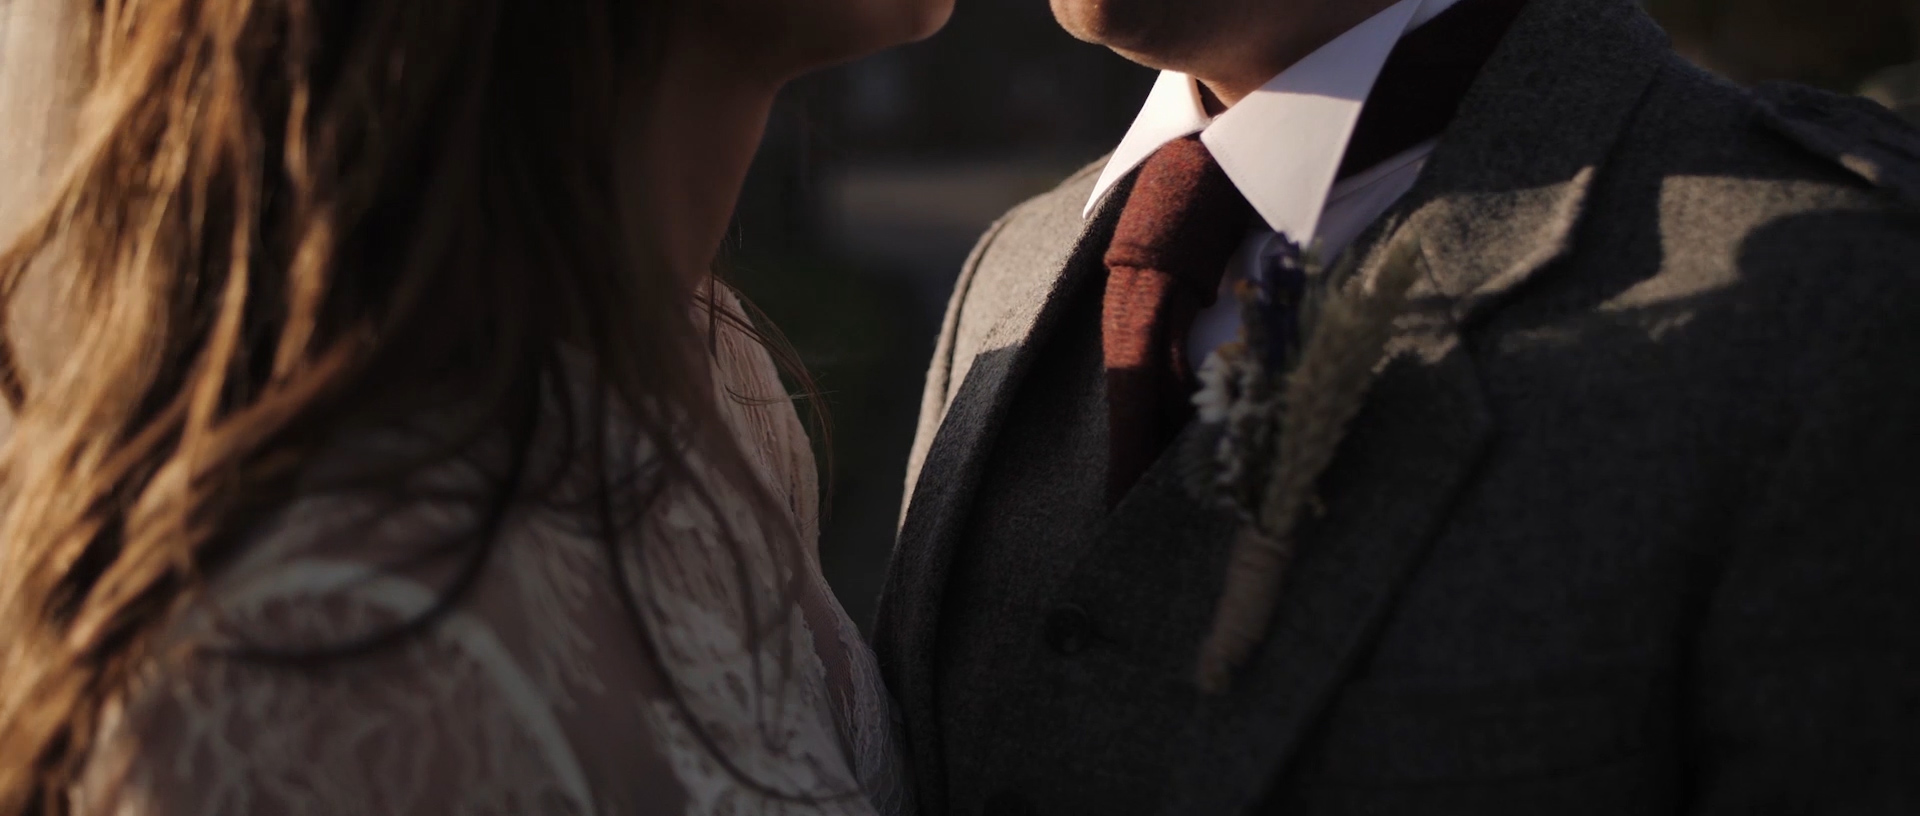 drygate-wedding-videographer_LL_04.jpg